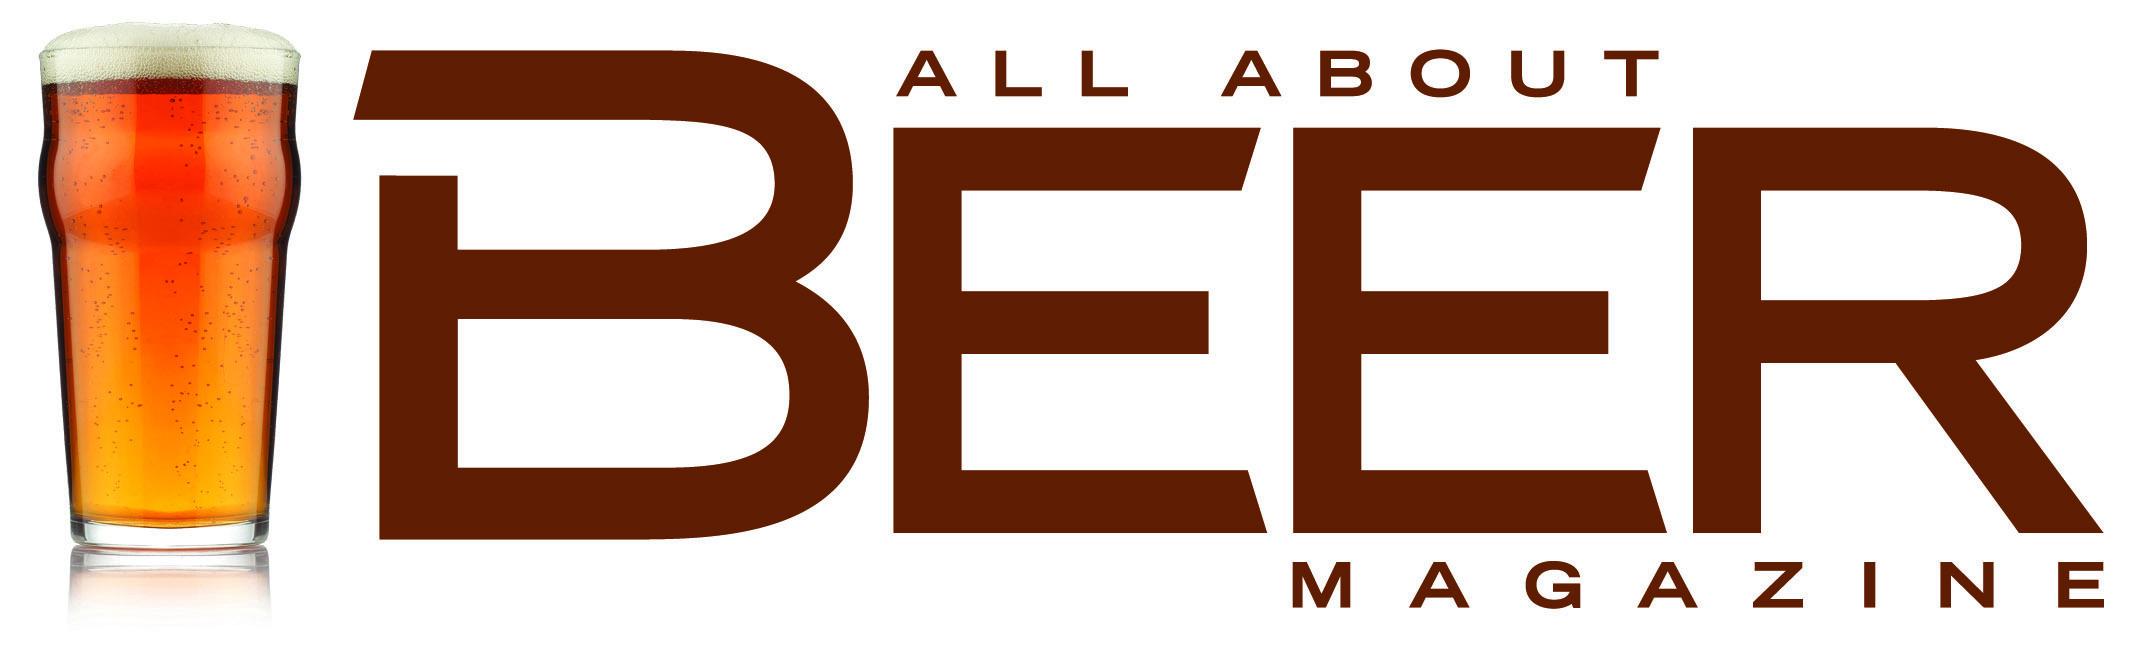 AAB_logo_2013_brown_reflect_lg